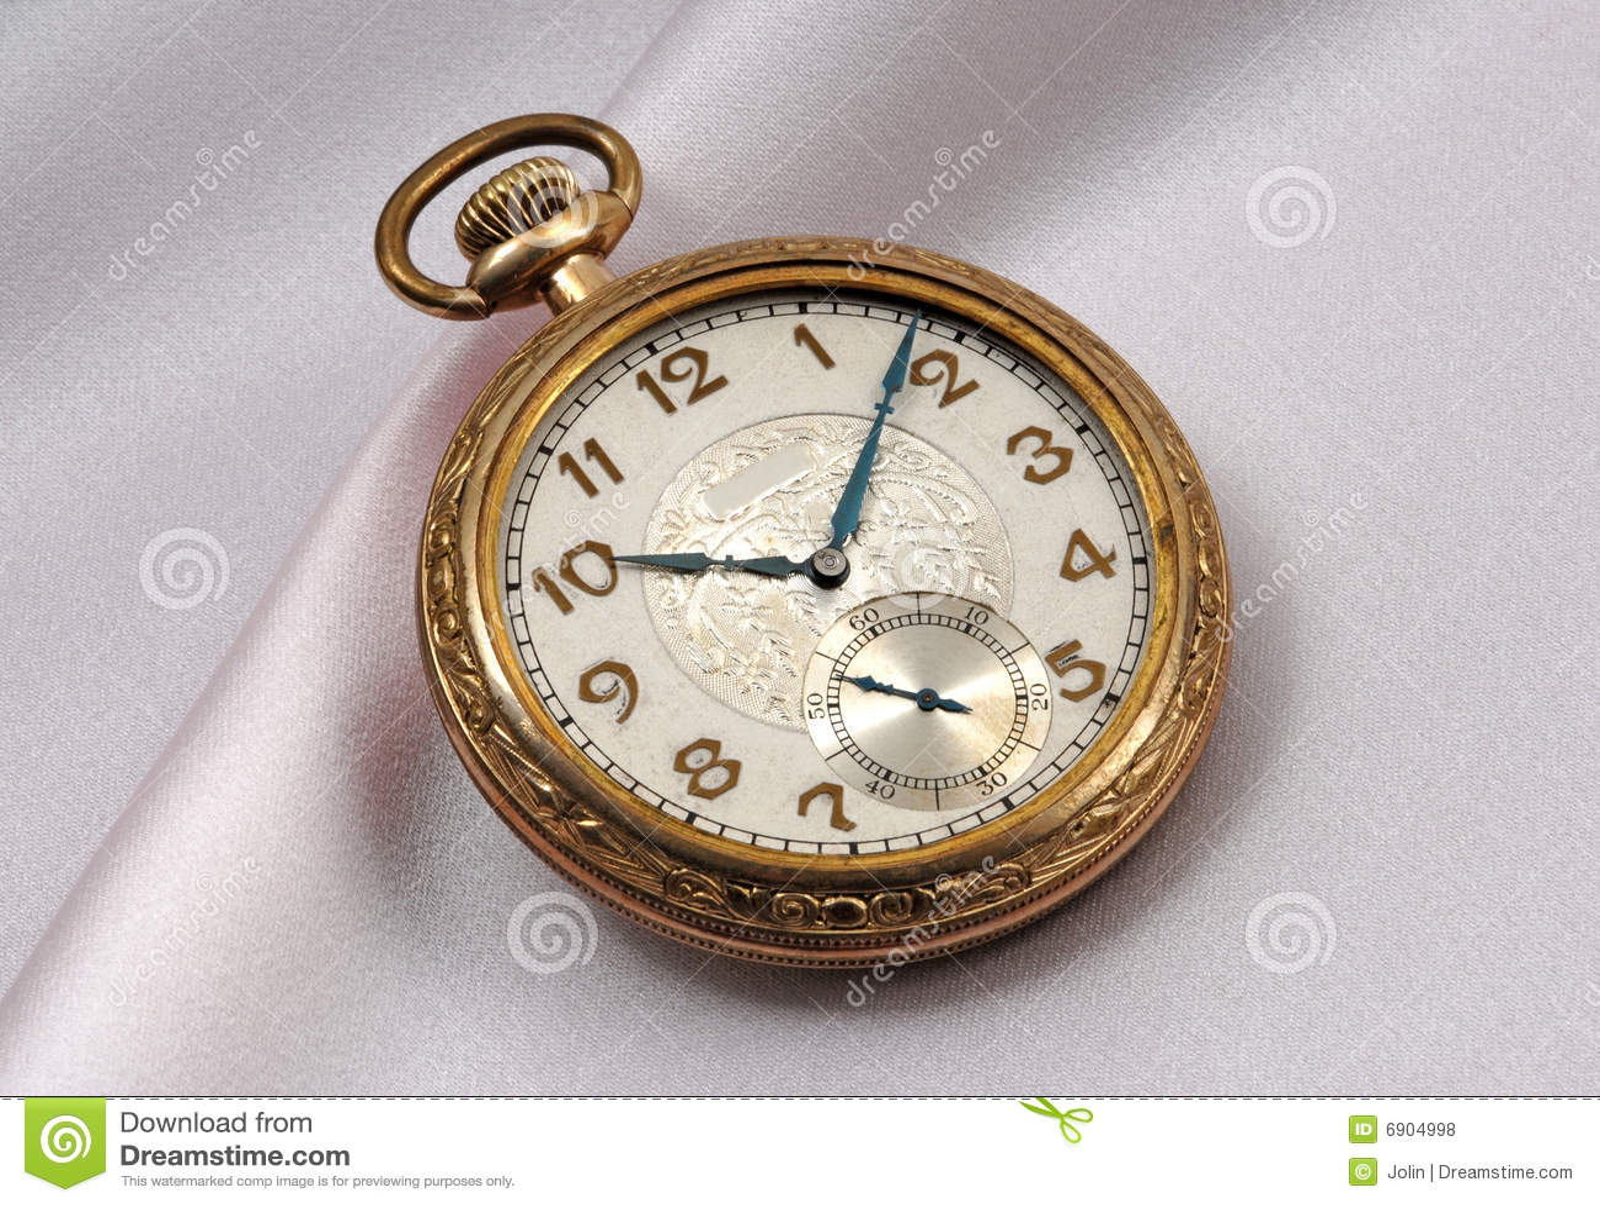 Golden watch - Photo by Manon - Tookapic